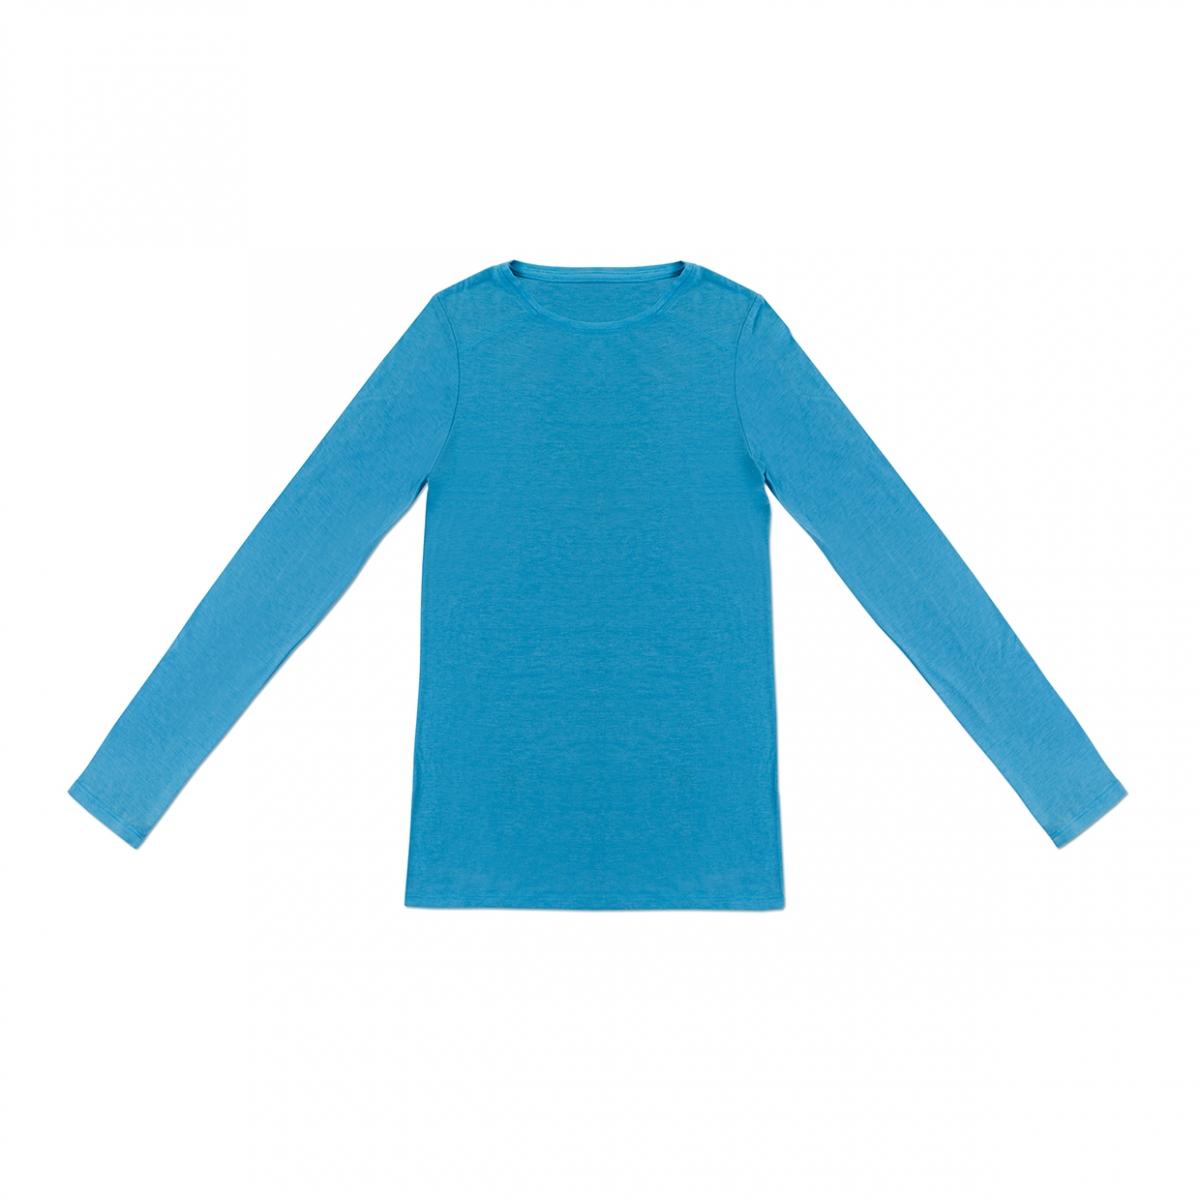 Imagen en la que sale una camiseta de manga larga